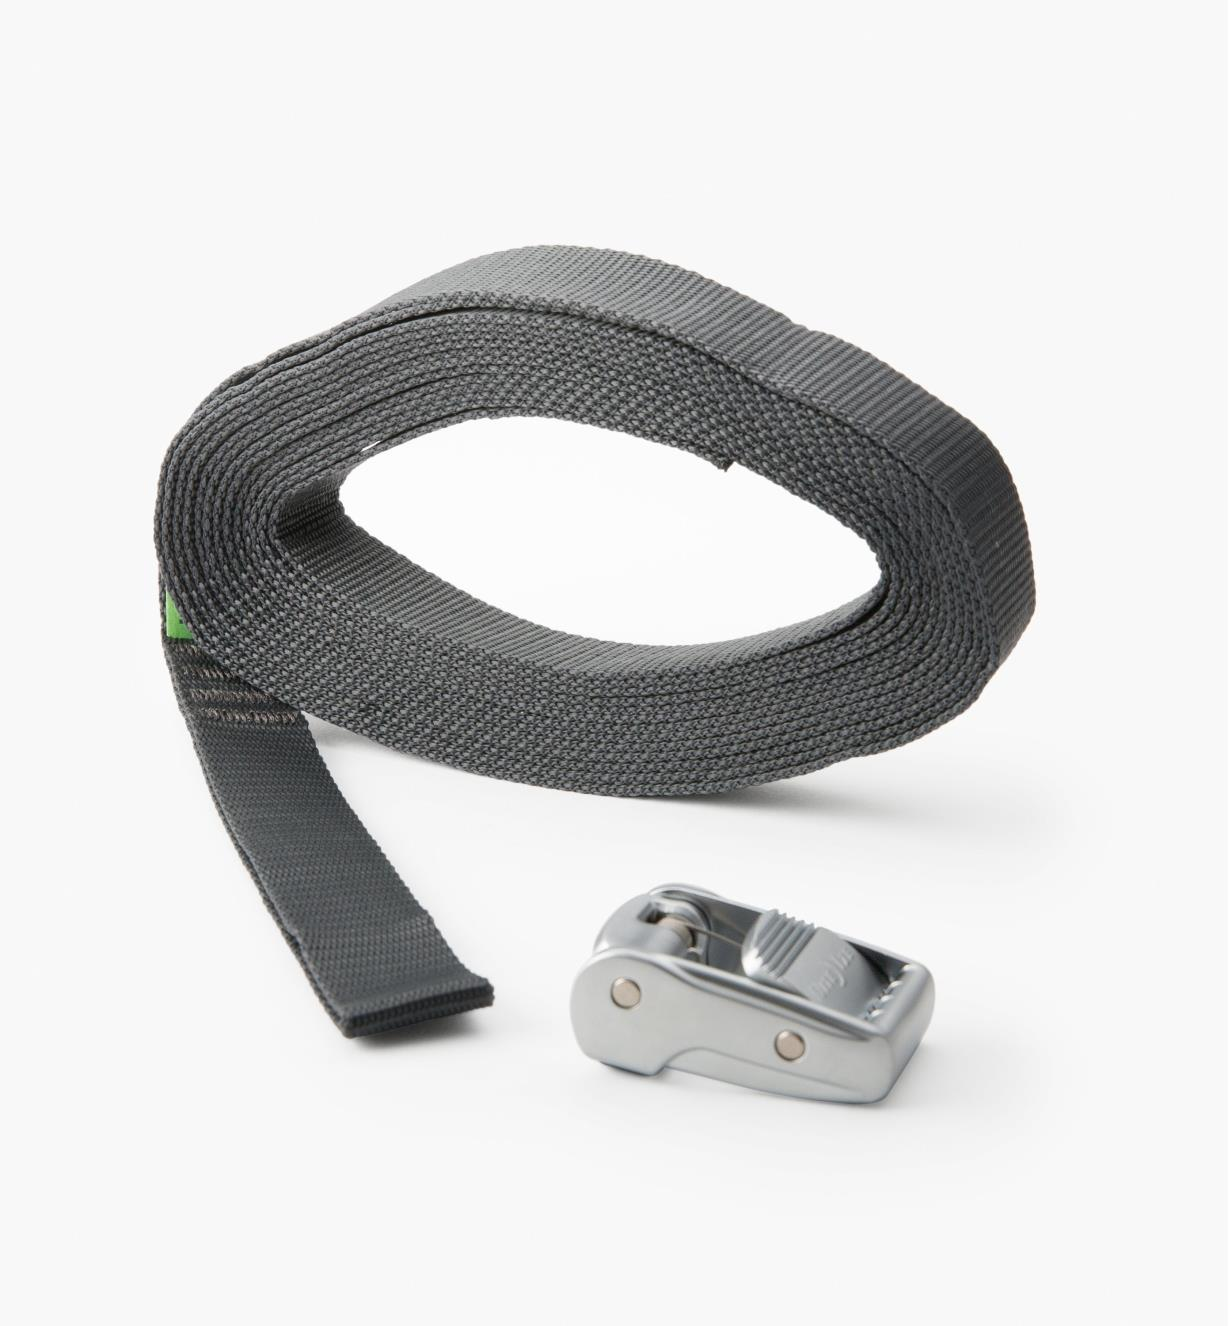 68K0922 - 18' Dual CamJam Tie-Down